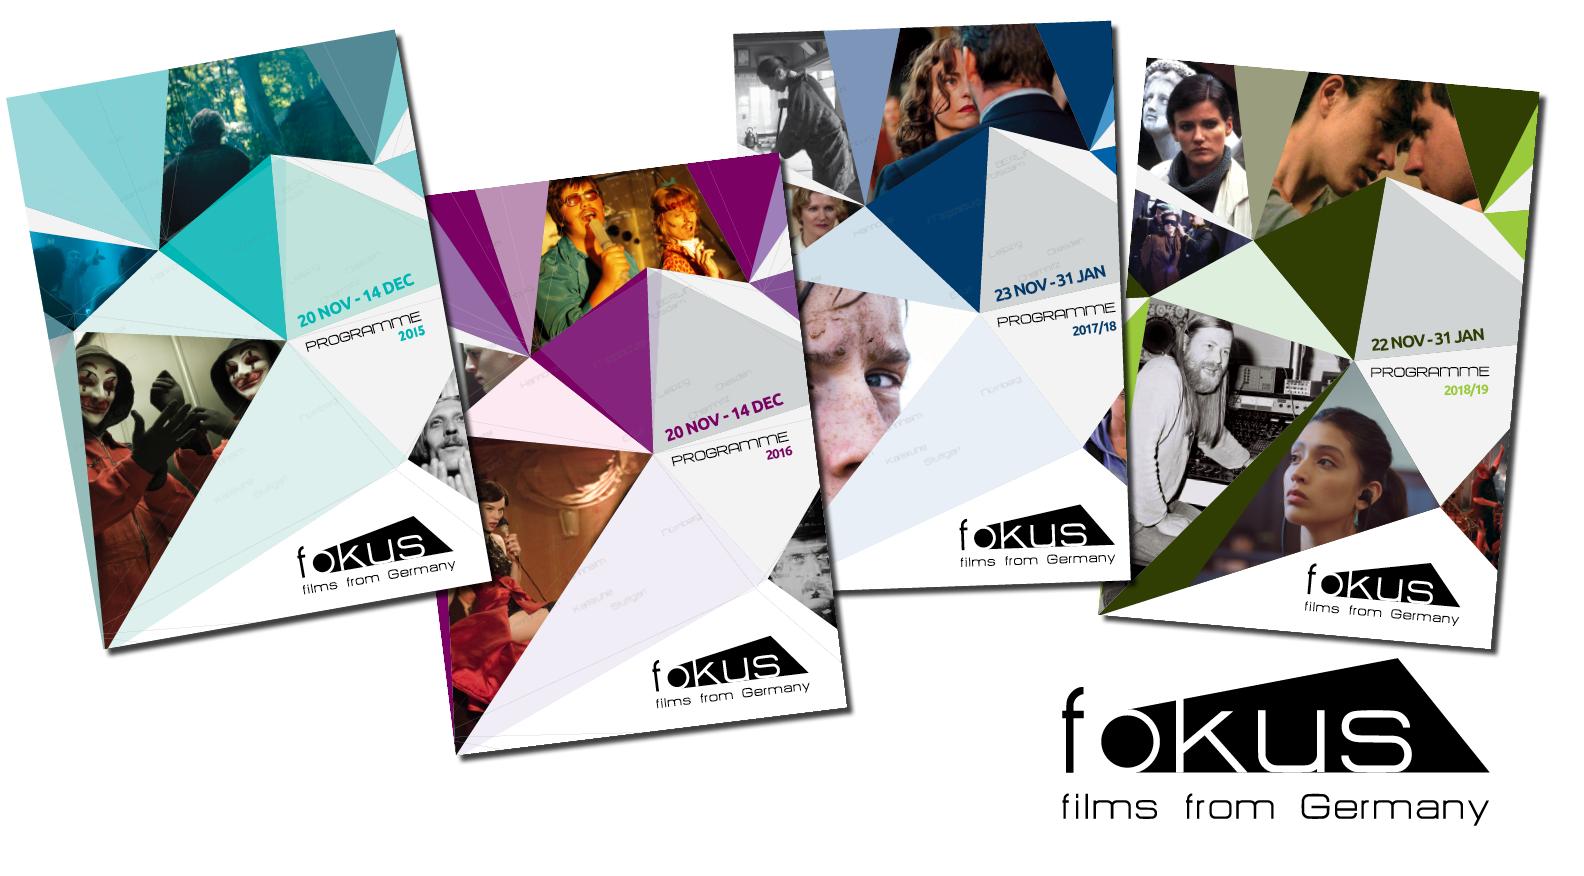 FOKUS Films from Germany